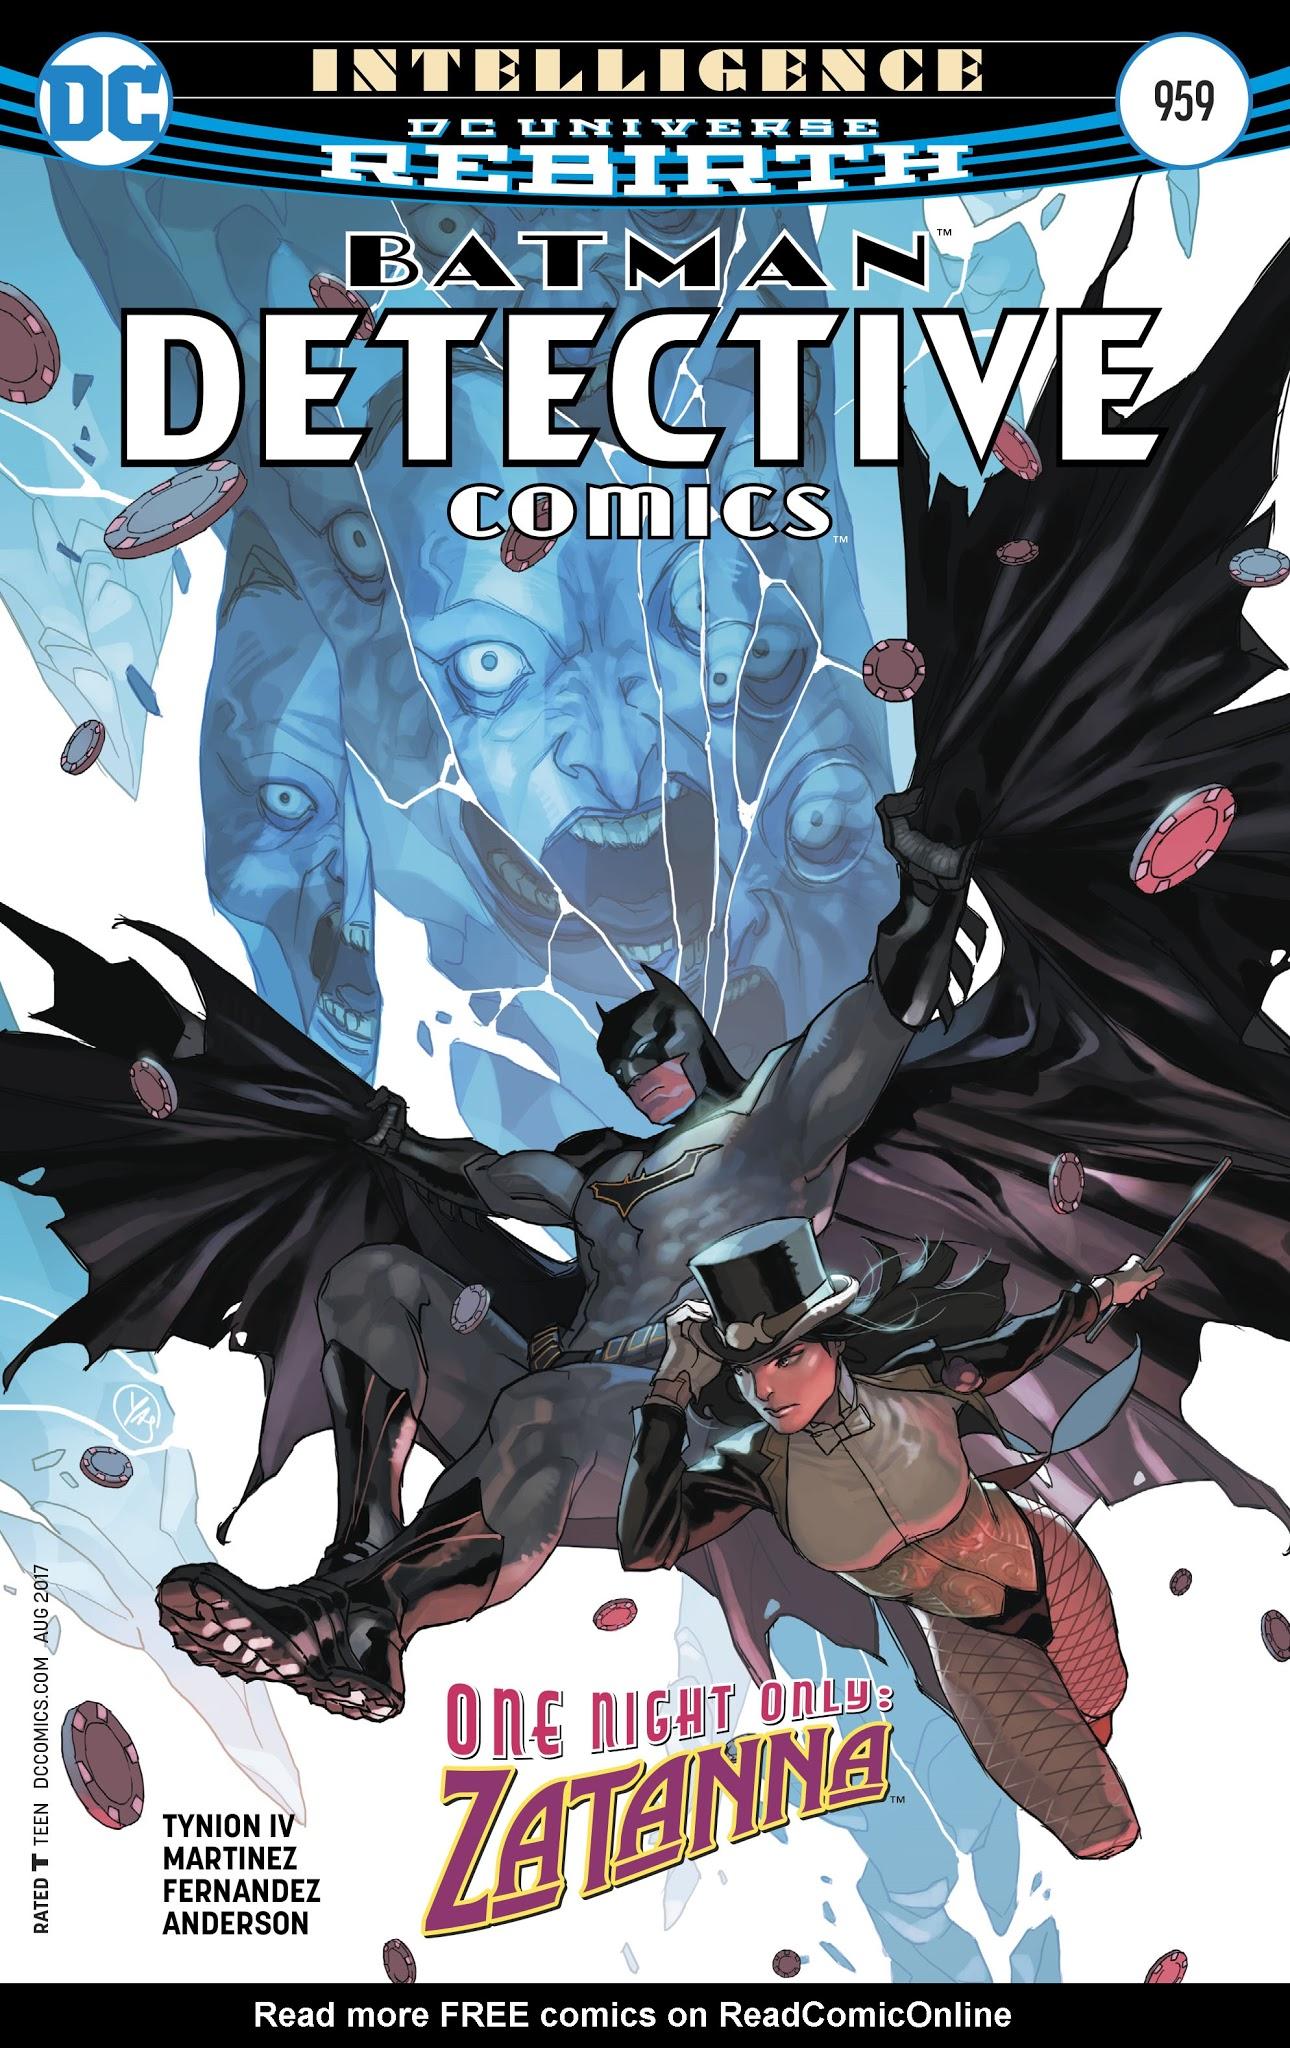 Detective Comics (2016) 959 Page 1